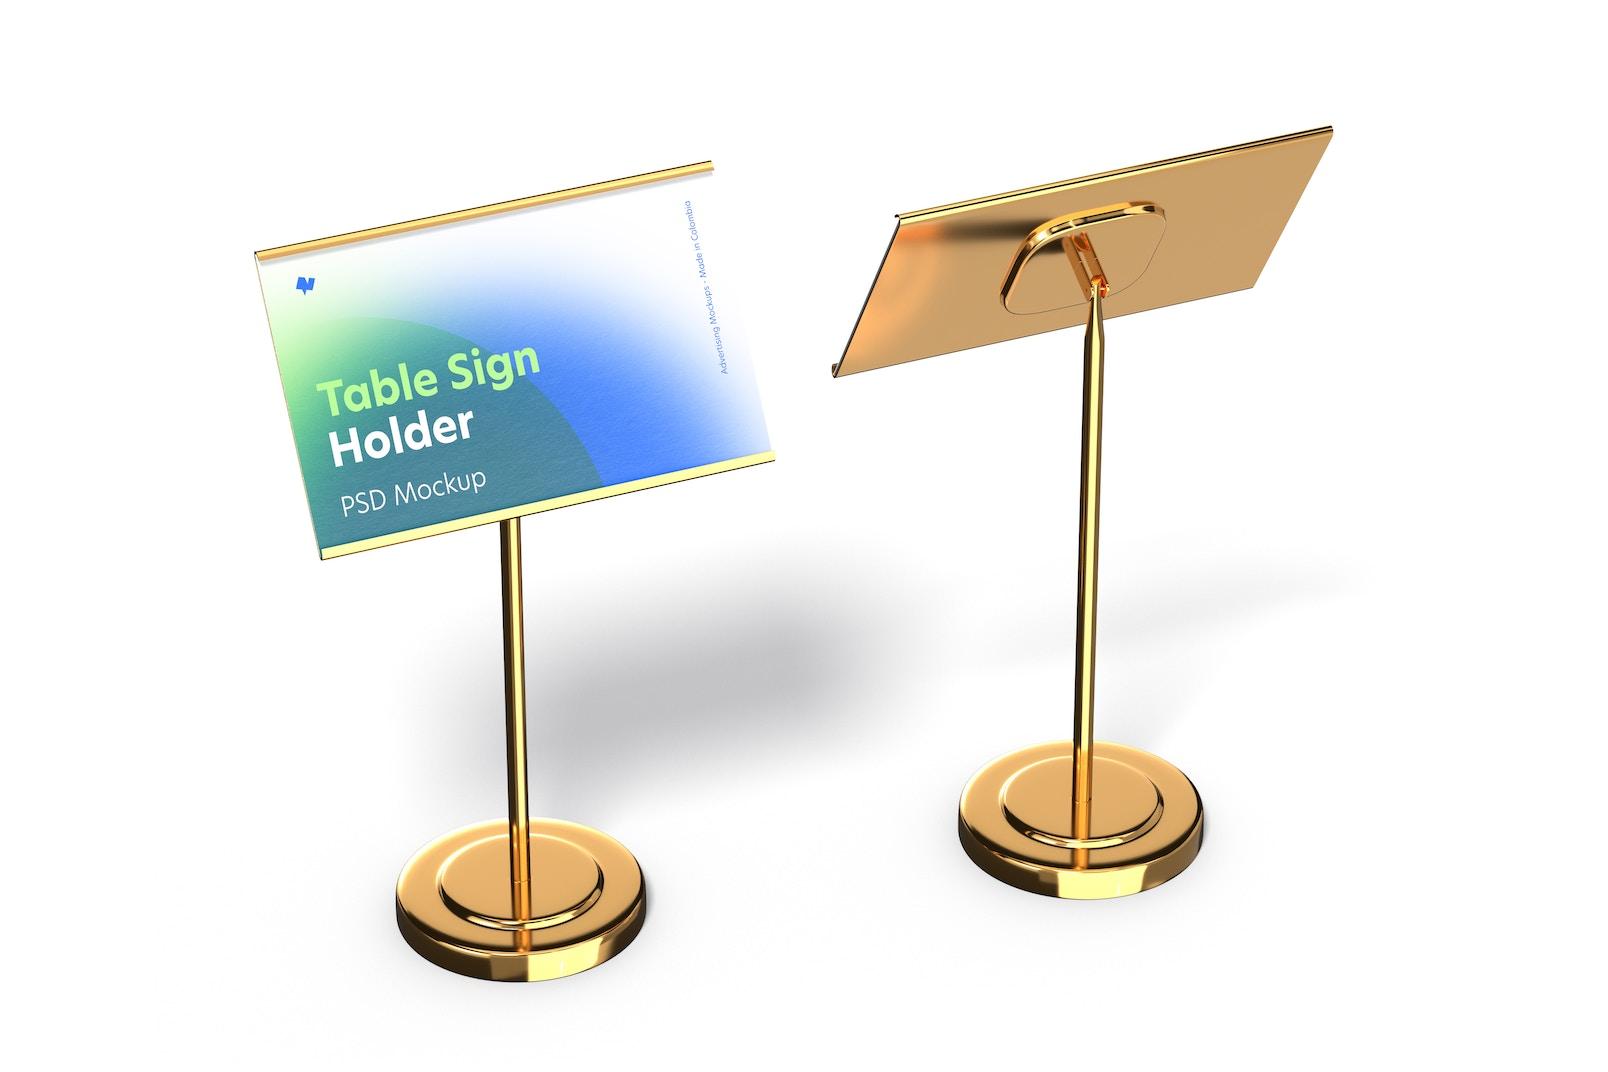 Table Sign Holders Metallic Base Mockup, Perspective